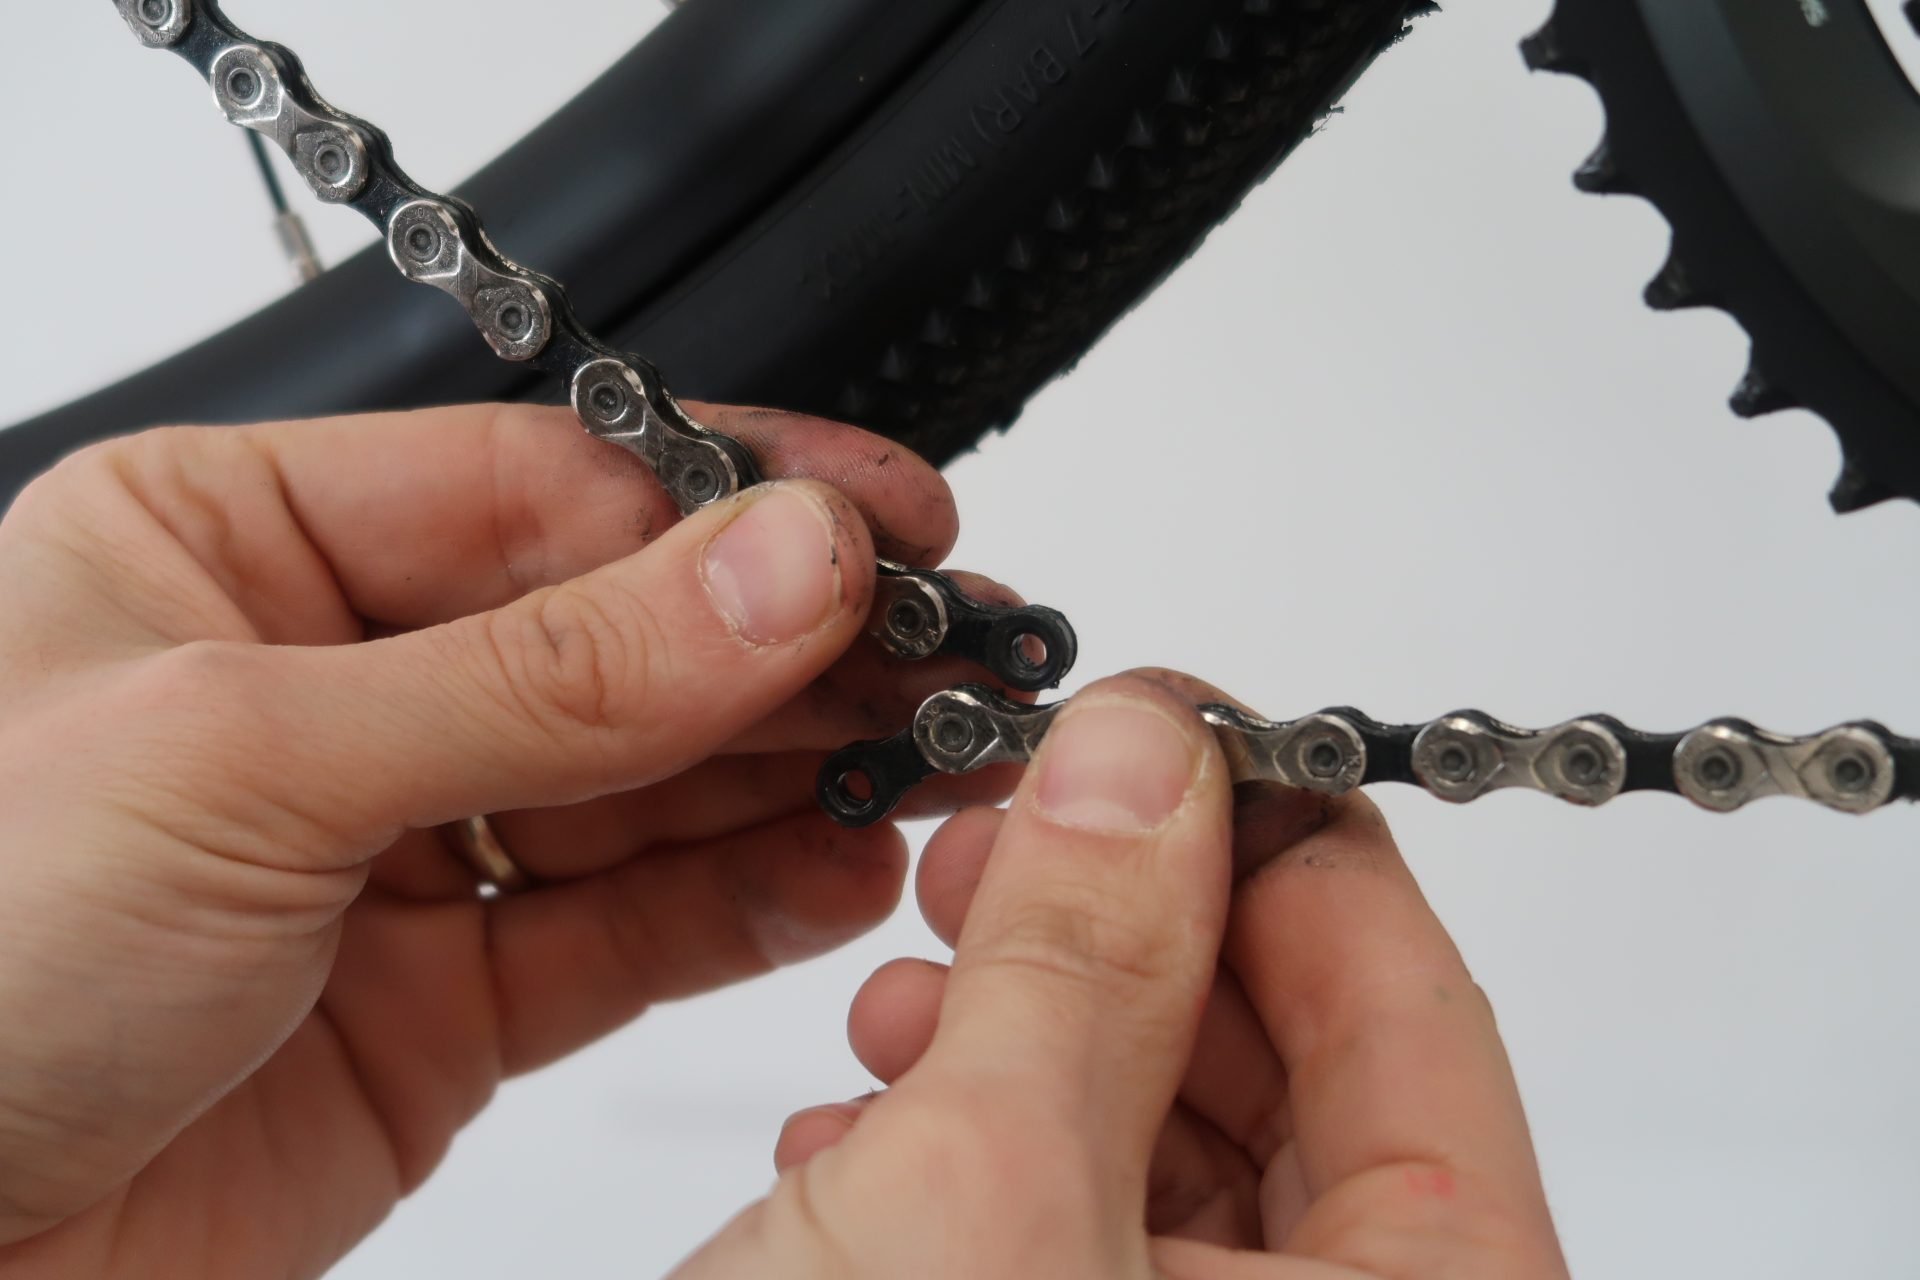 Meccanica per MTB, corso online